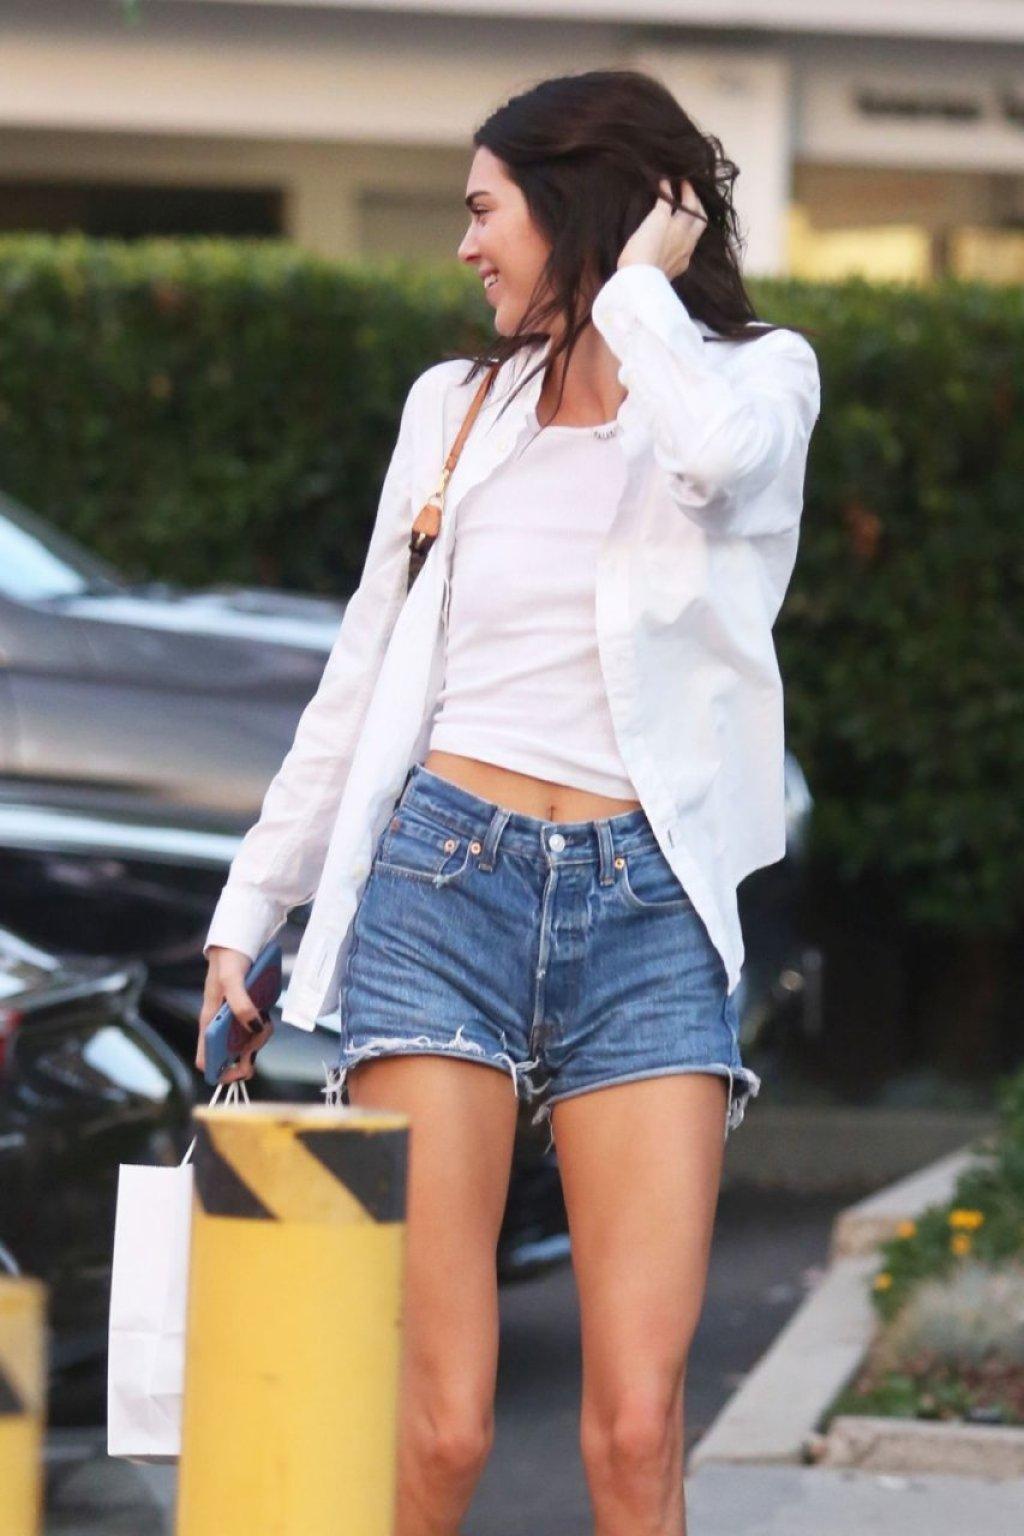 Kendall Jenner See Through (19 Photos)